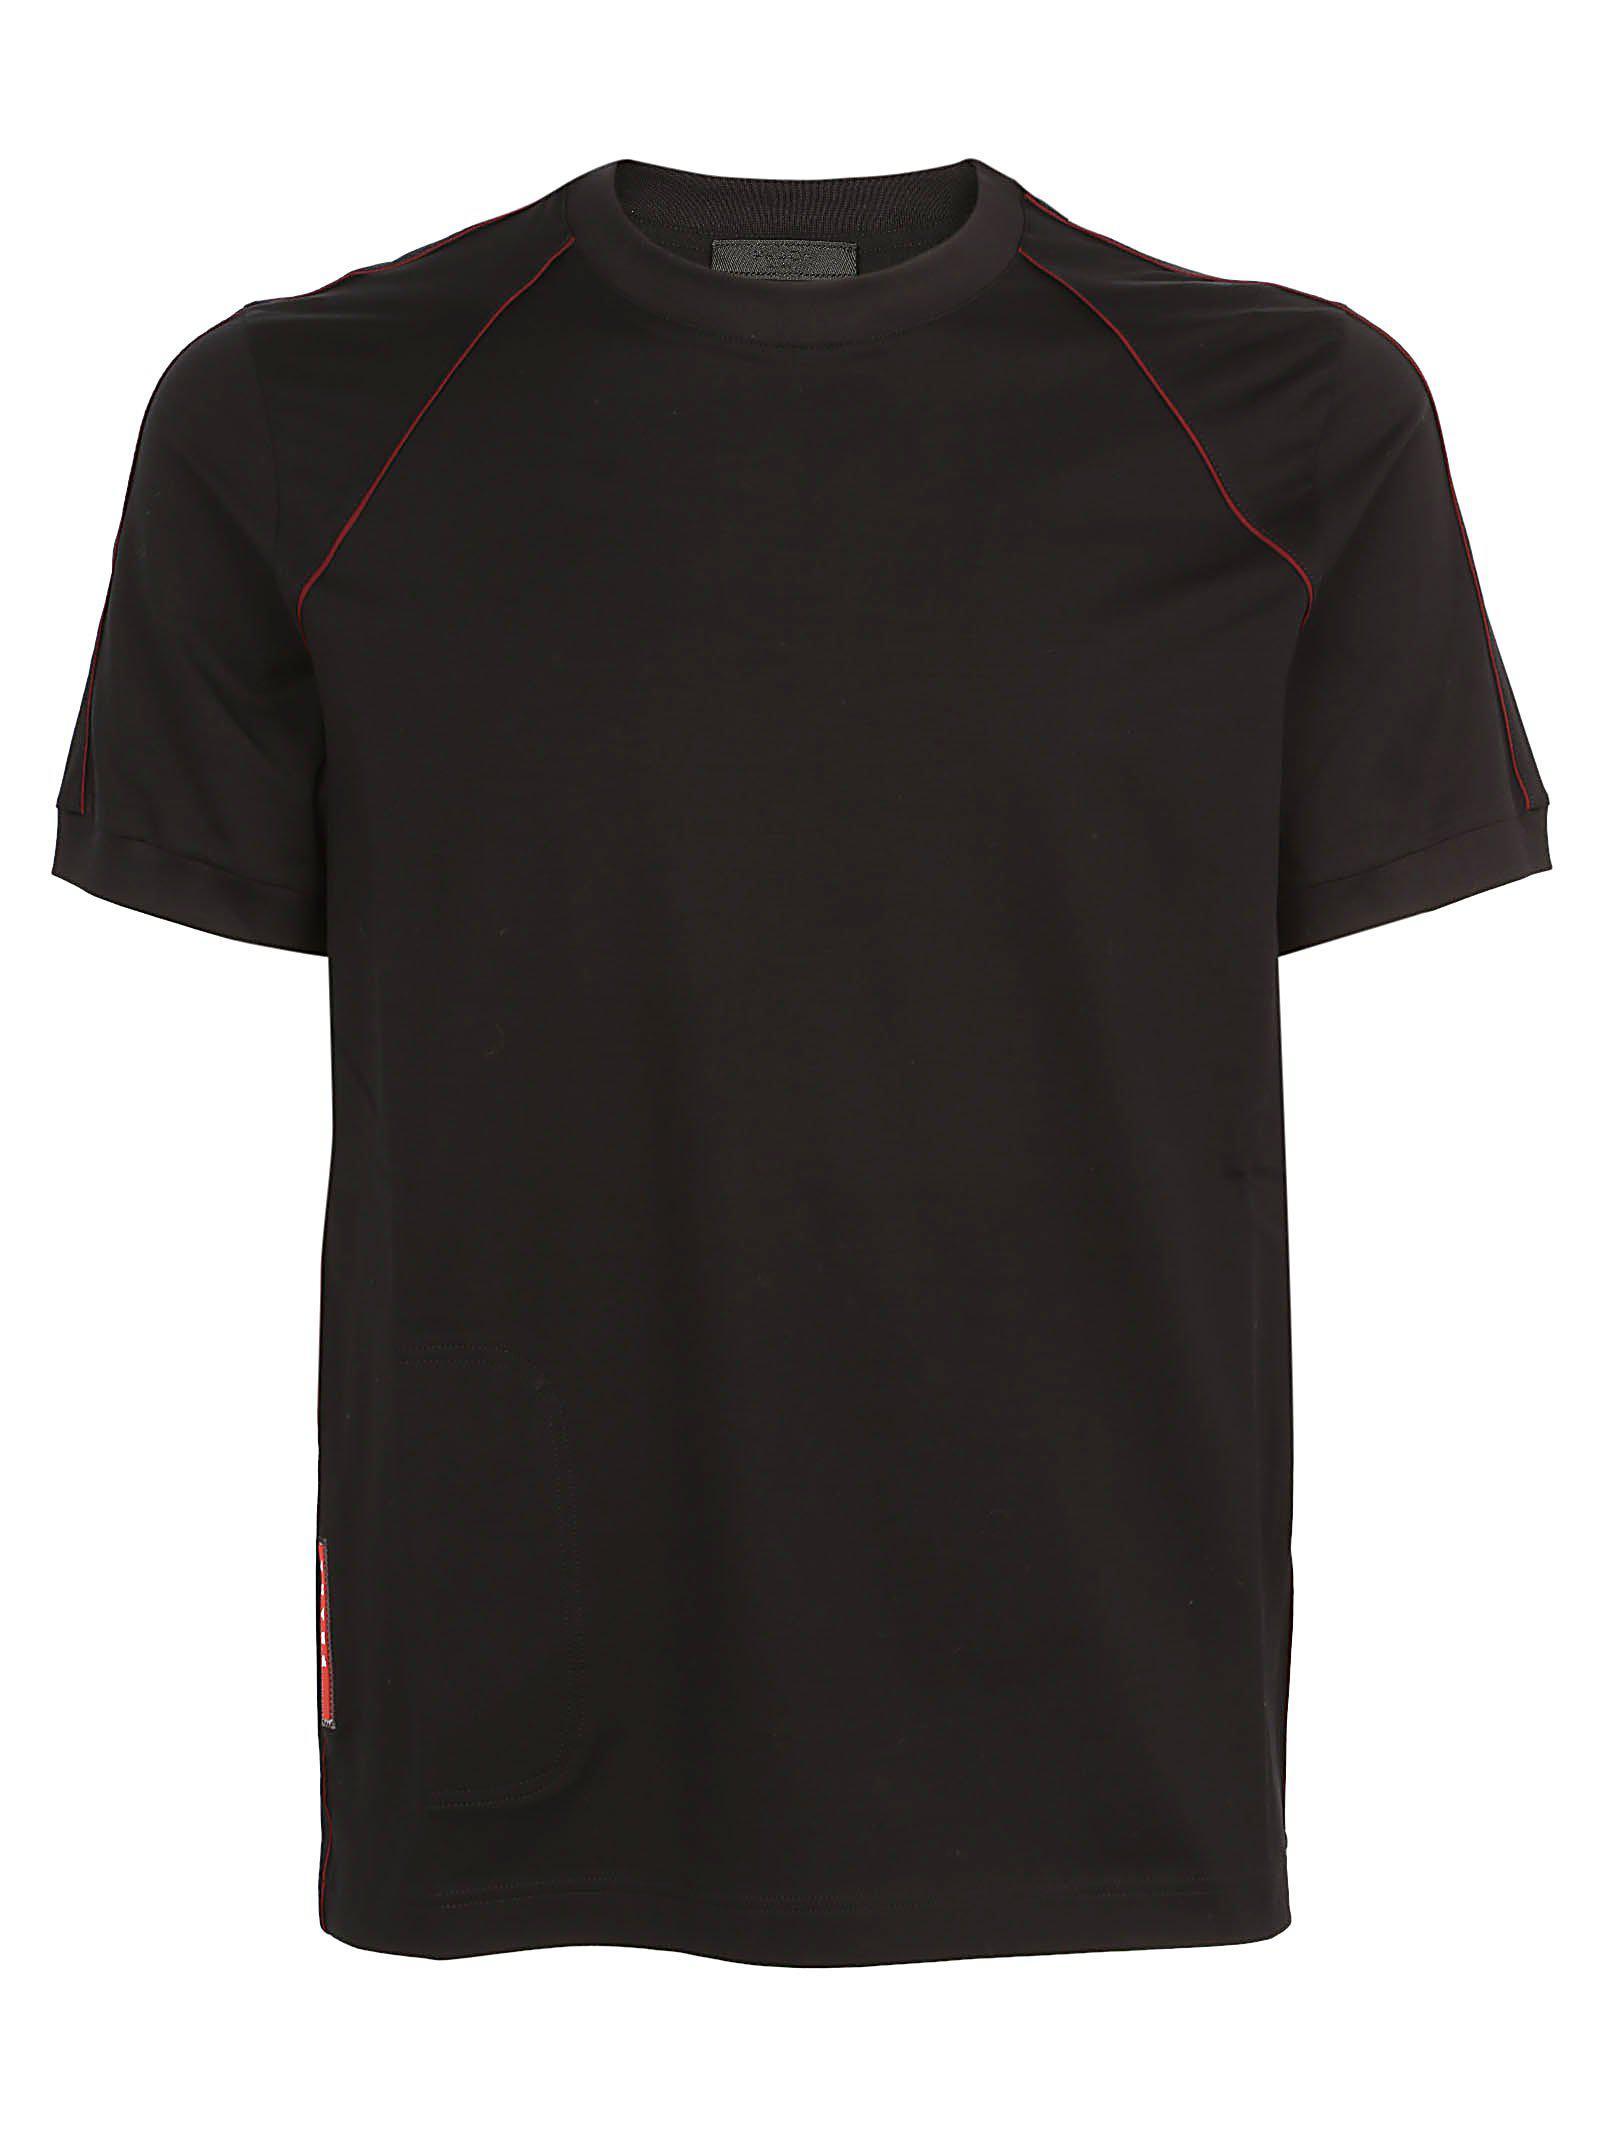 6eee2c3b279f Lyst - Prada Classic Logo T-shirt in Black for Men